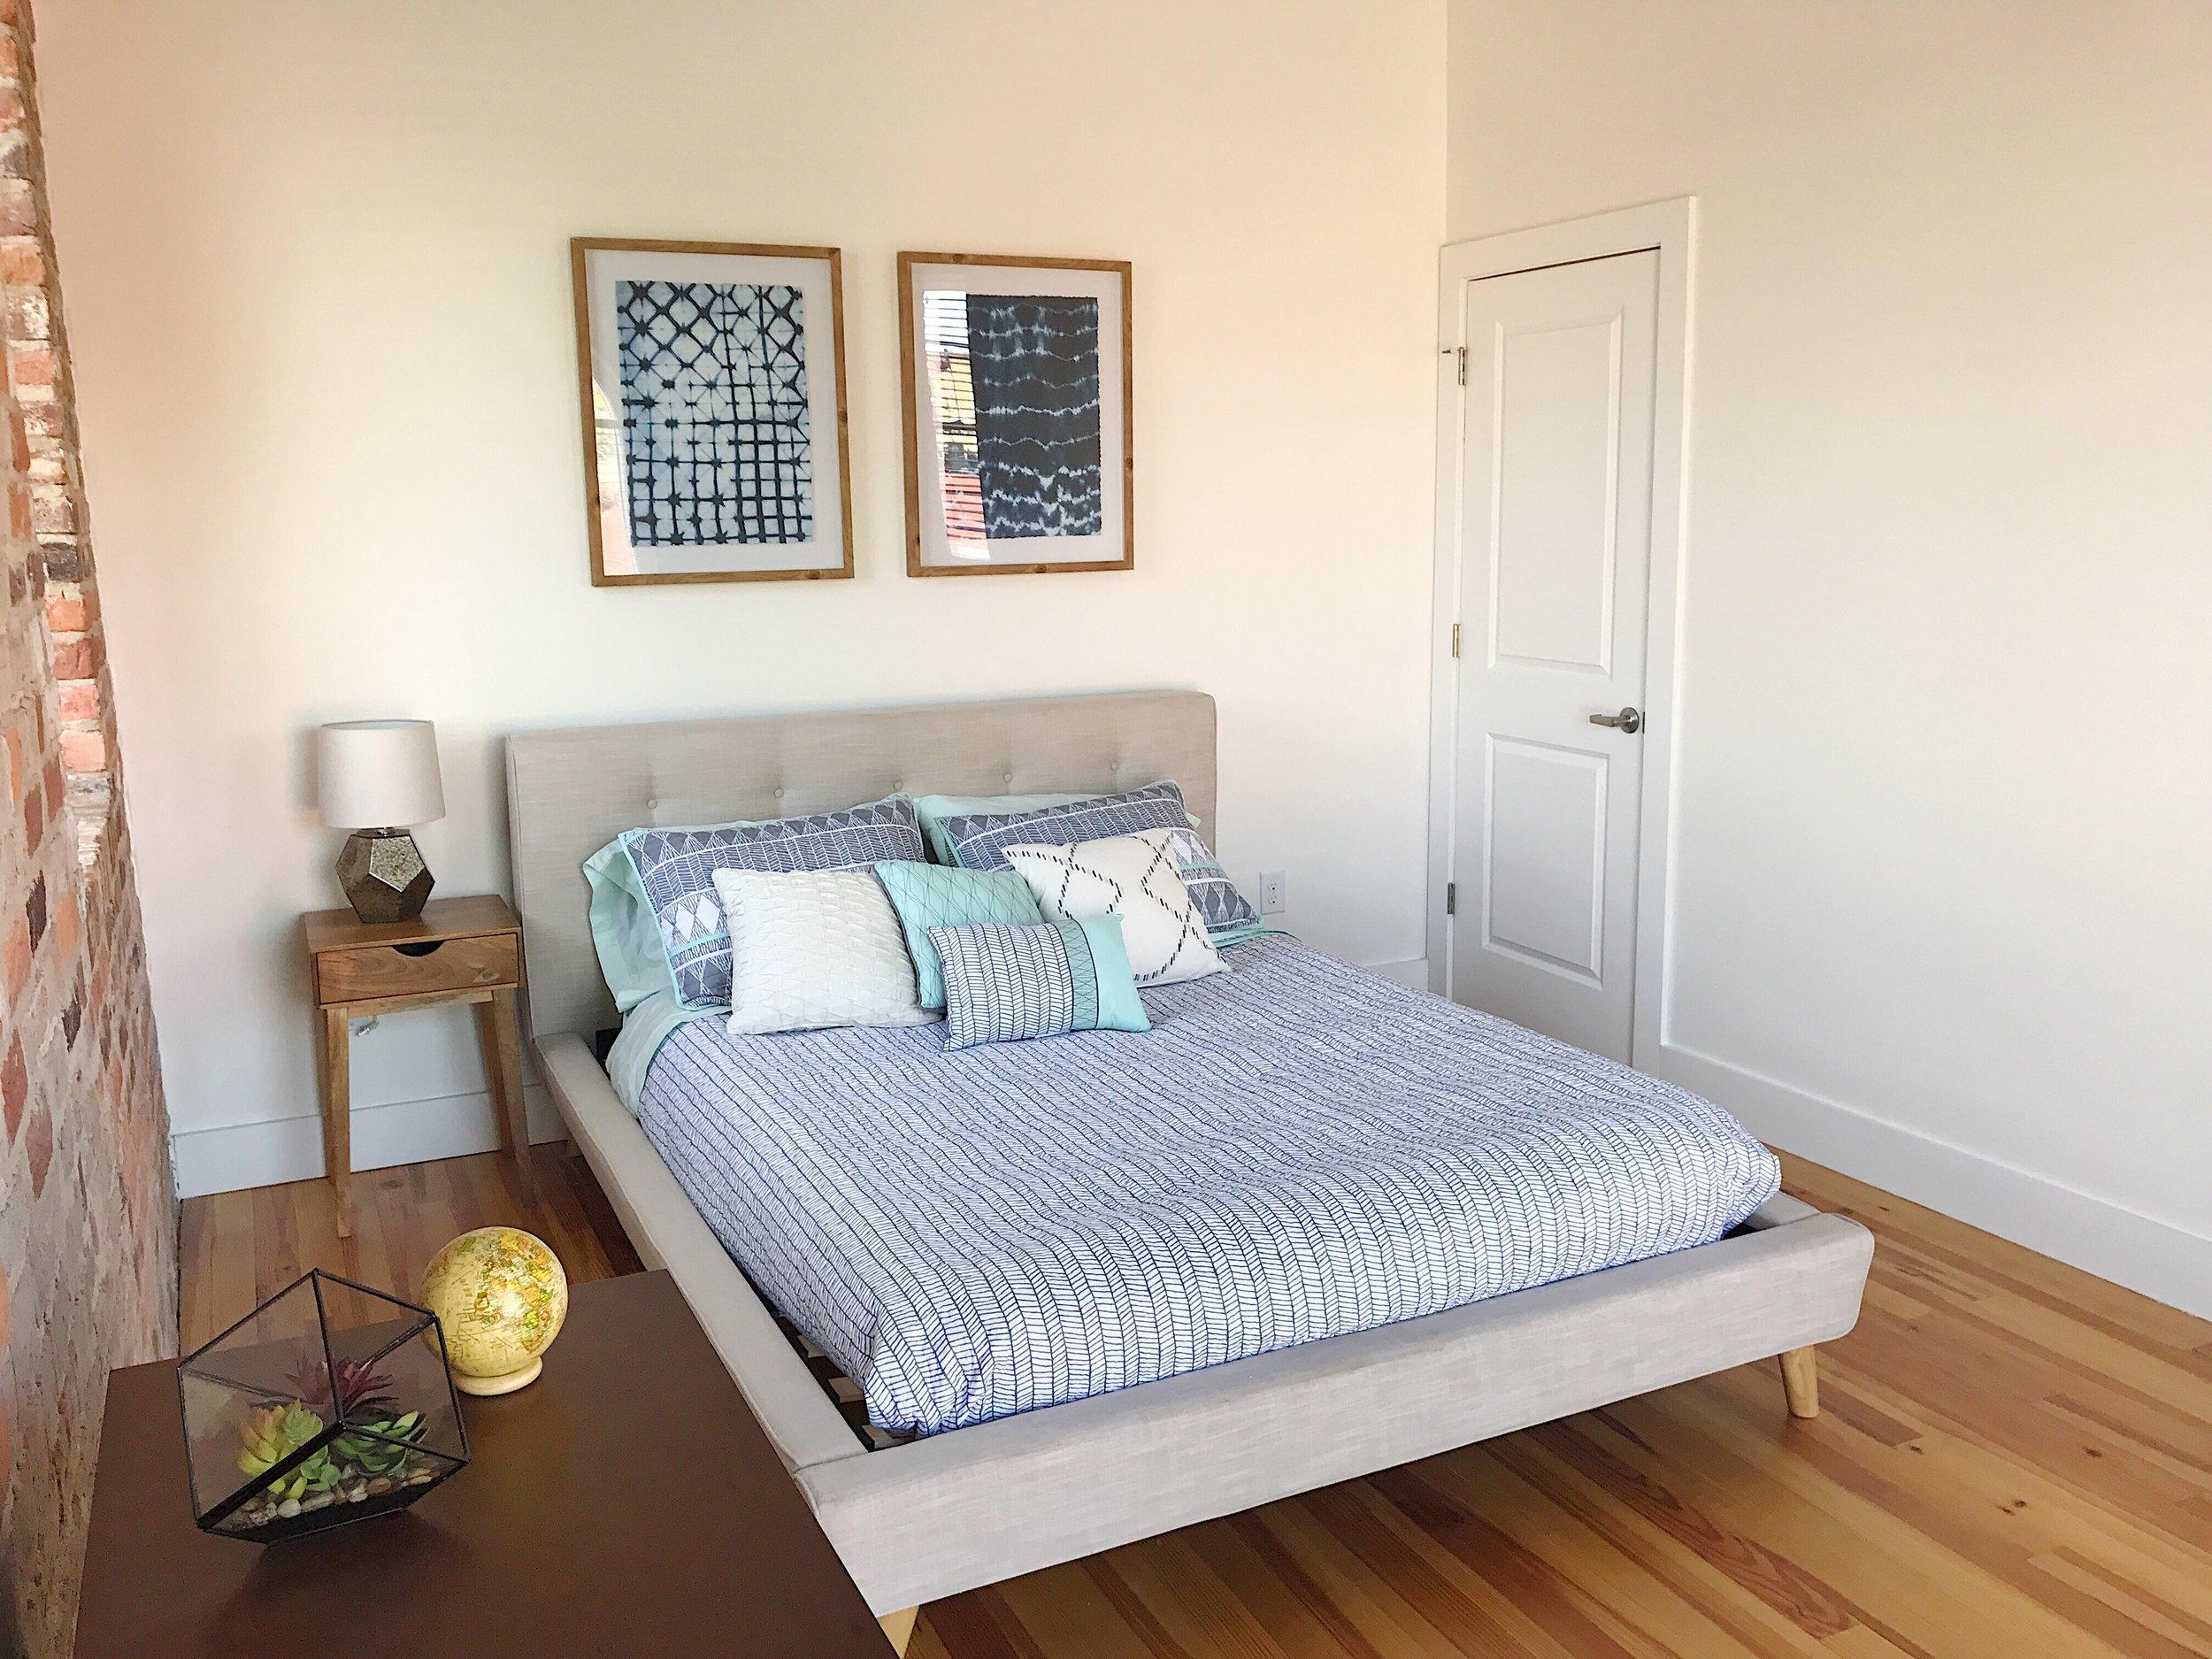 TPZM bedroom 1.jpg